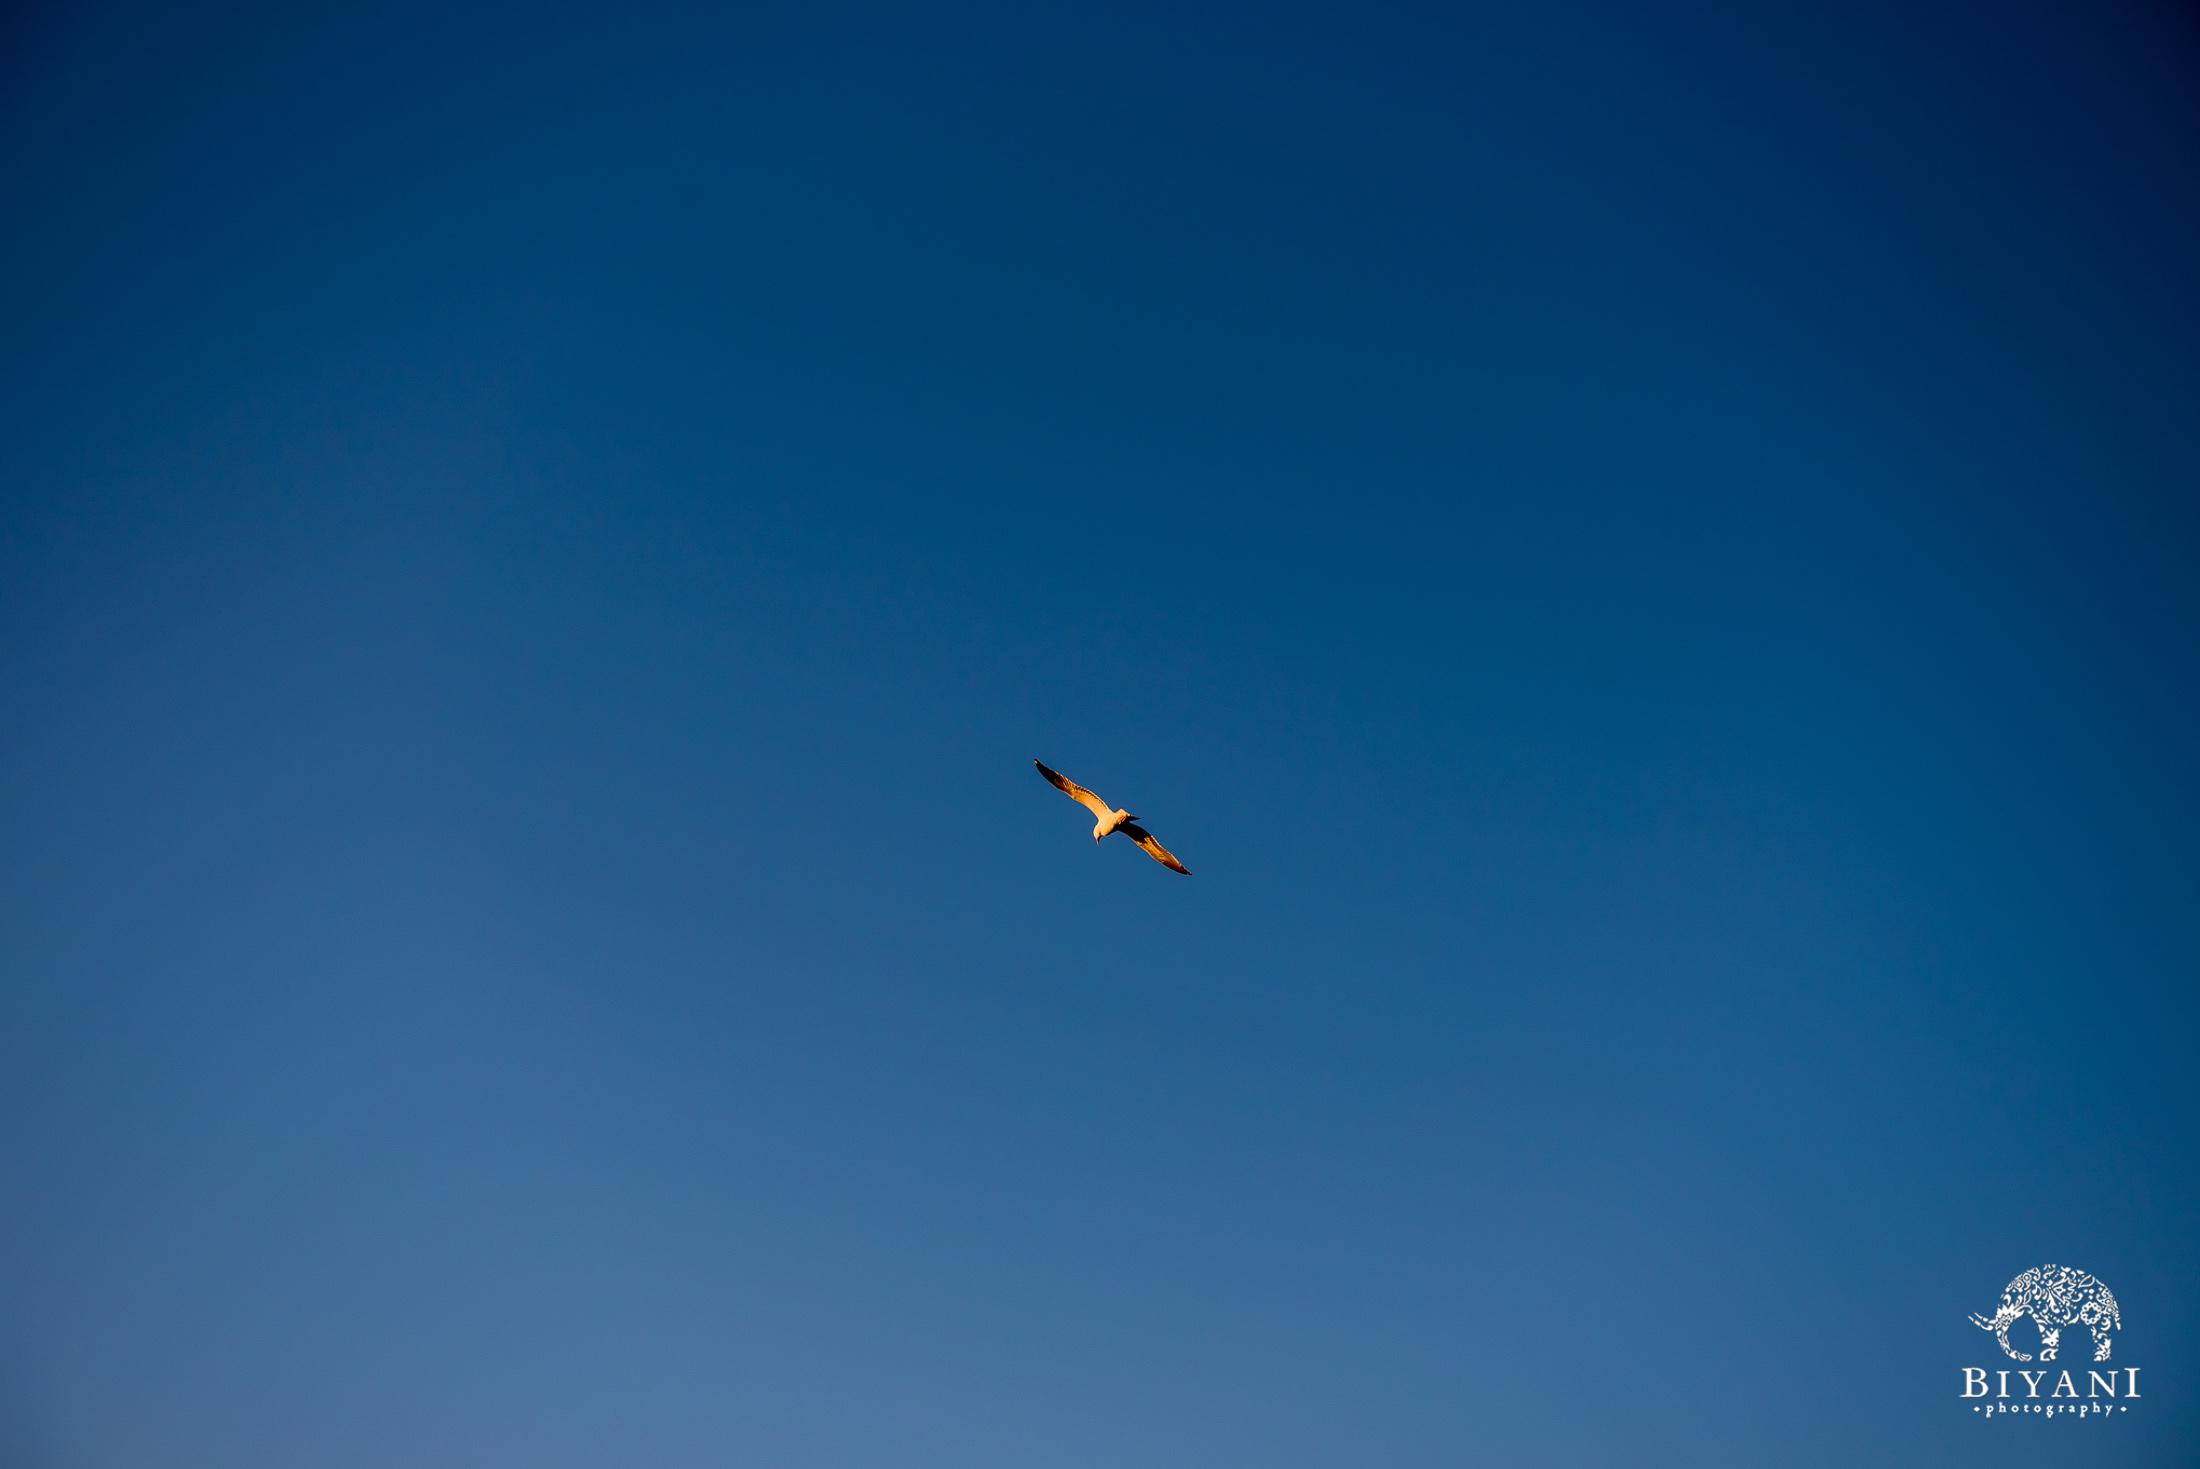 bird soaring through a clear blue sky